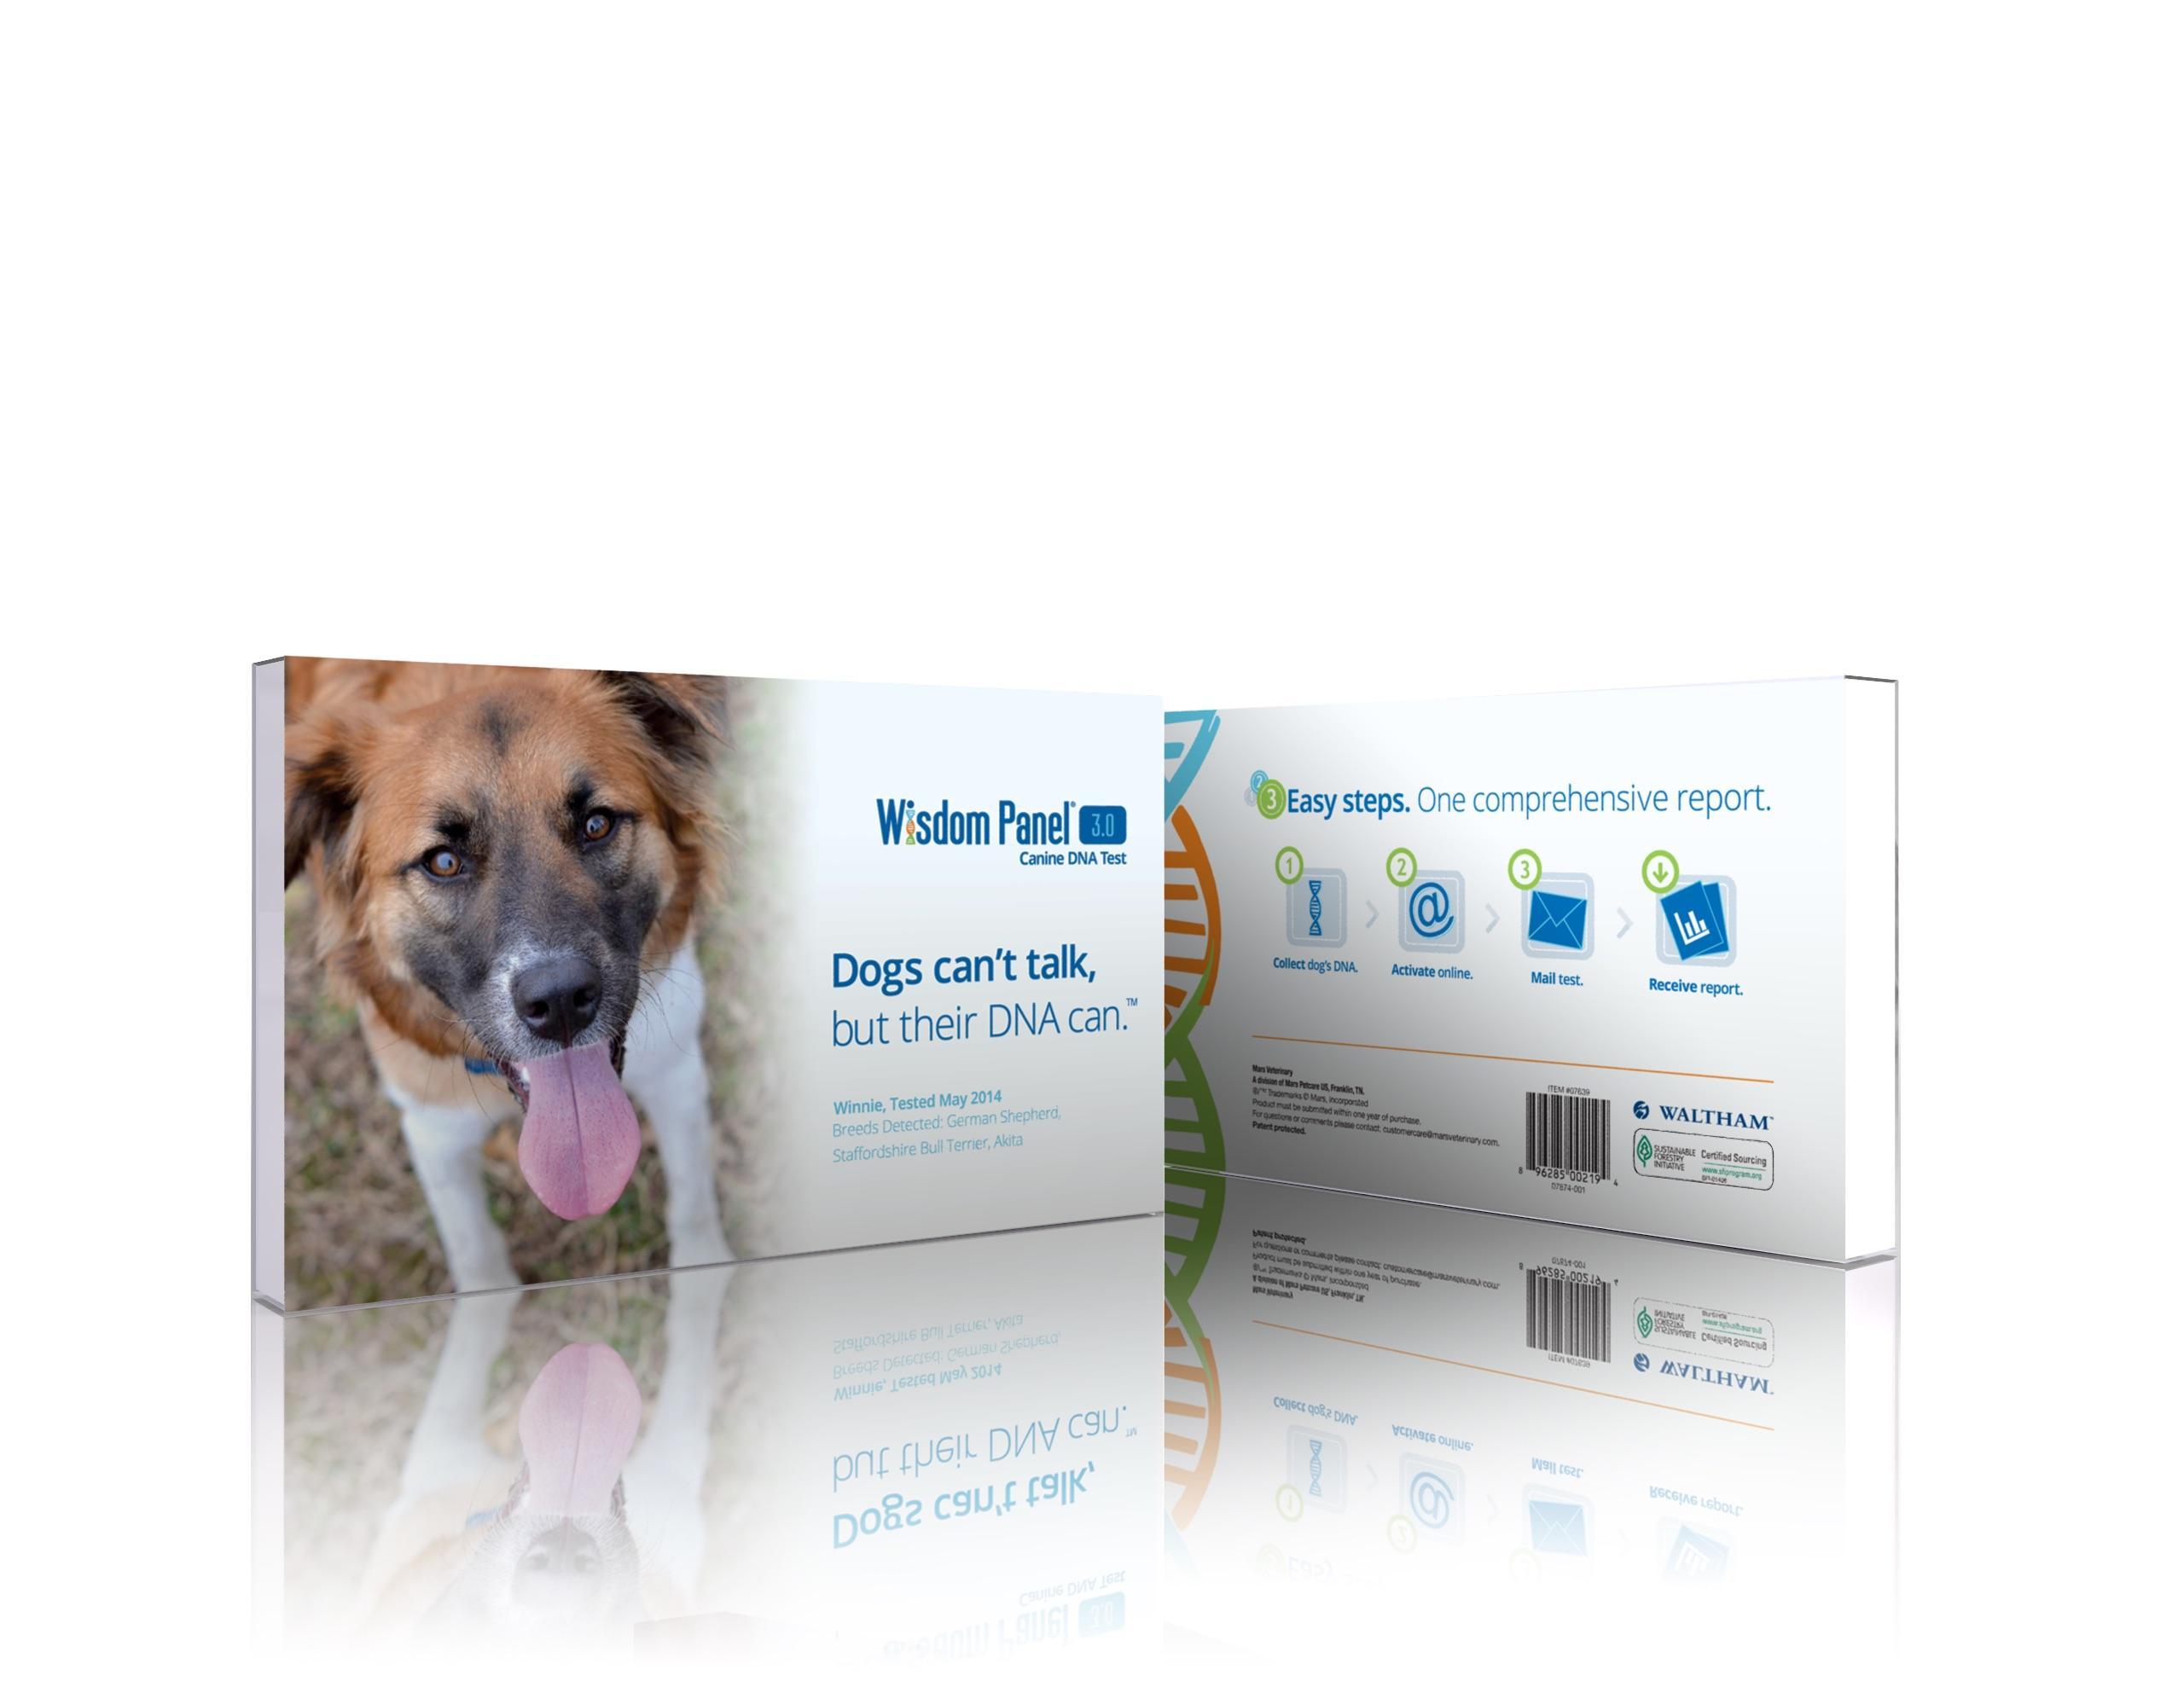 mars veterinary wisdom panel 3 0 breed identification dna test kit pet supplies. Black Bedroom Furniture Sets. Home Design Ideas